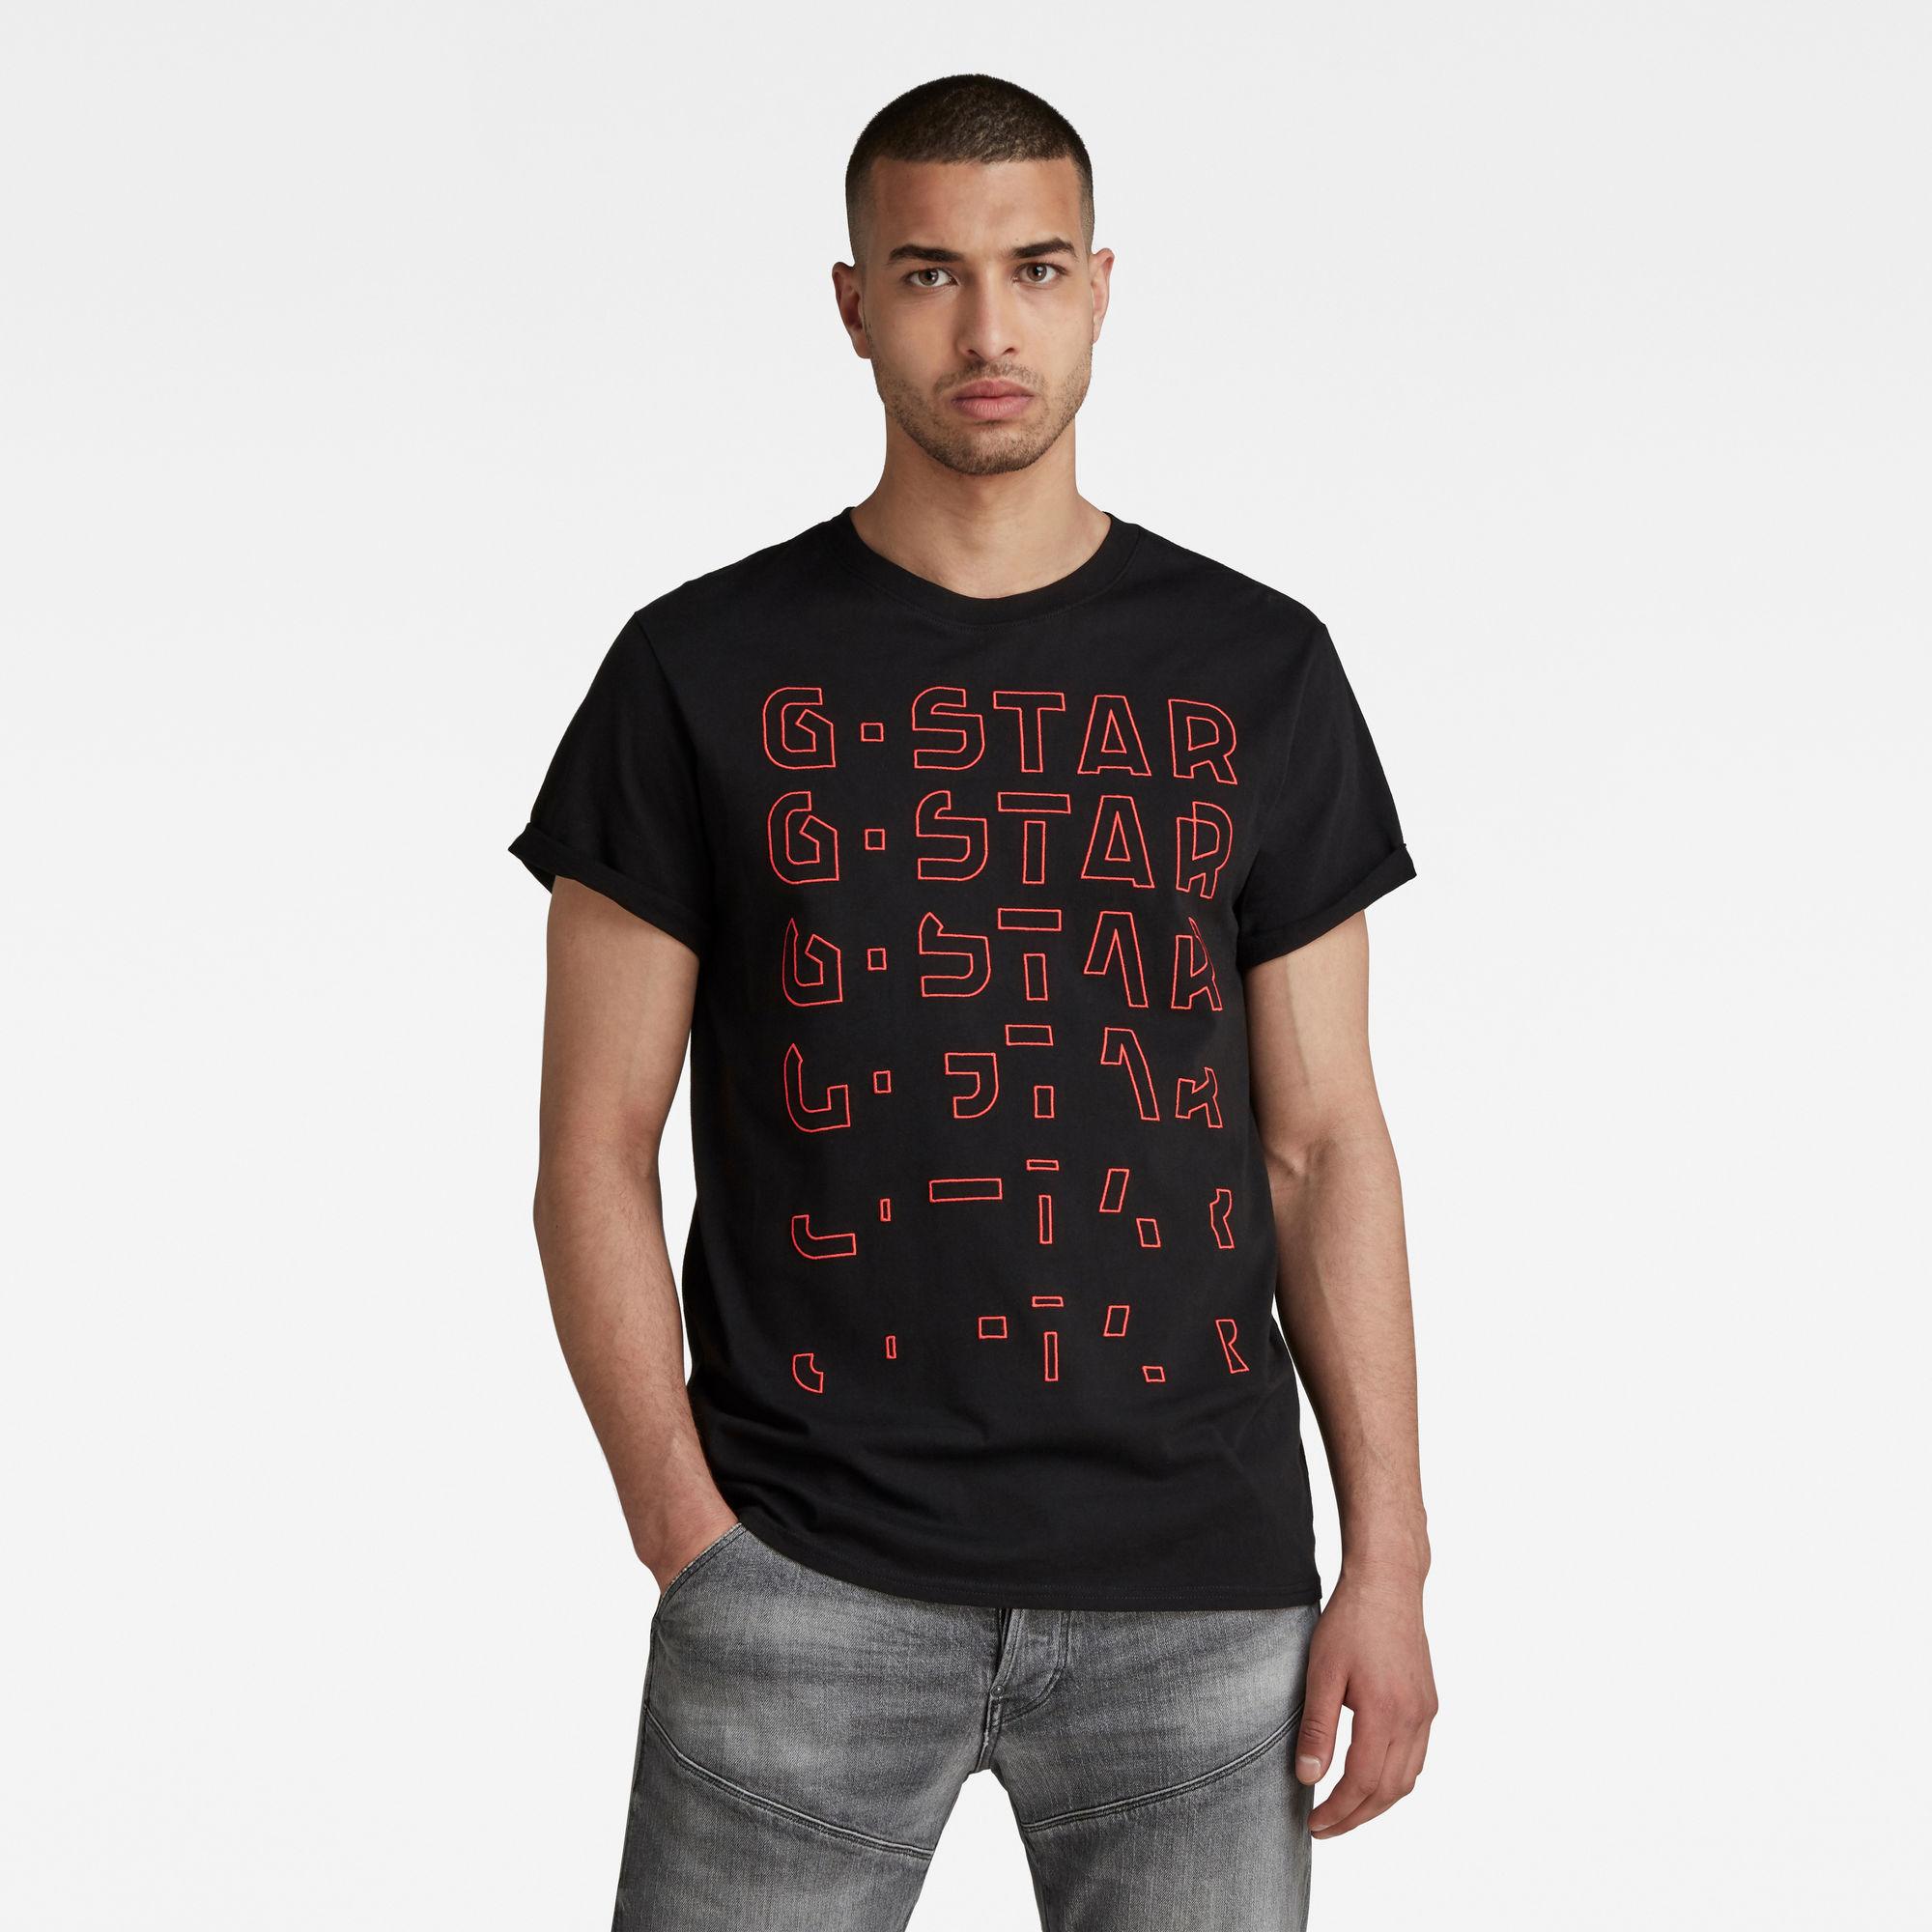 G-Star RAW Heren Embro Gradient Graphic Lash T-Shirt Zwart